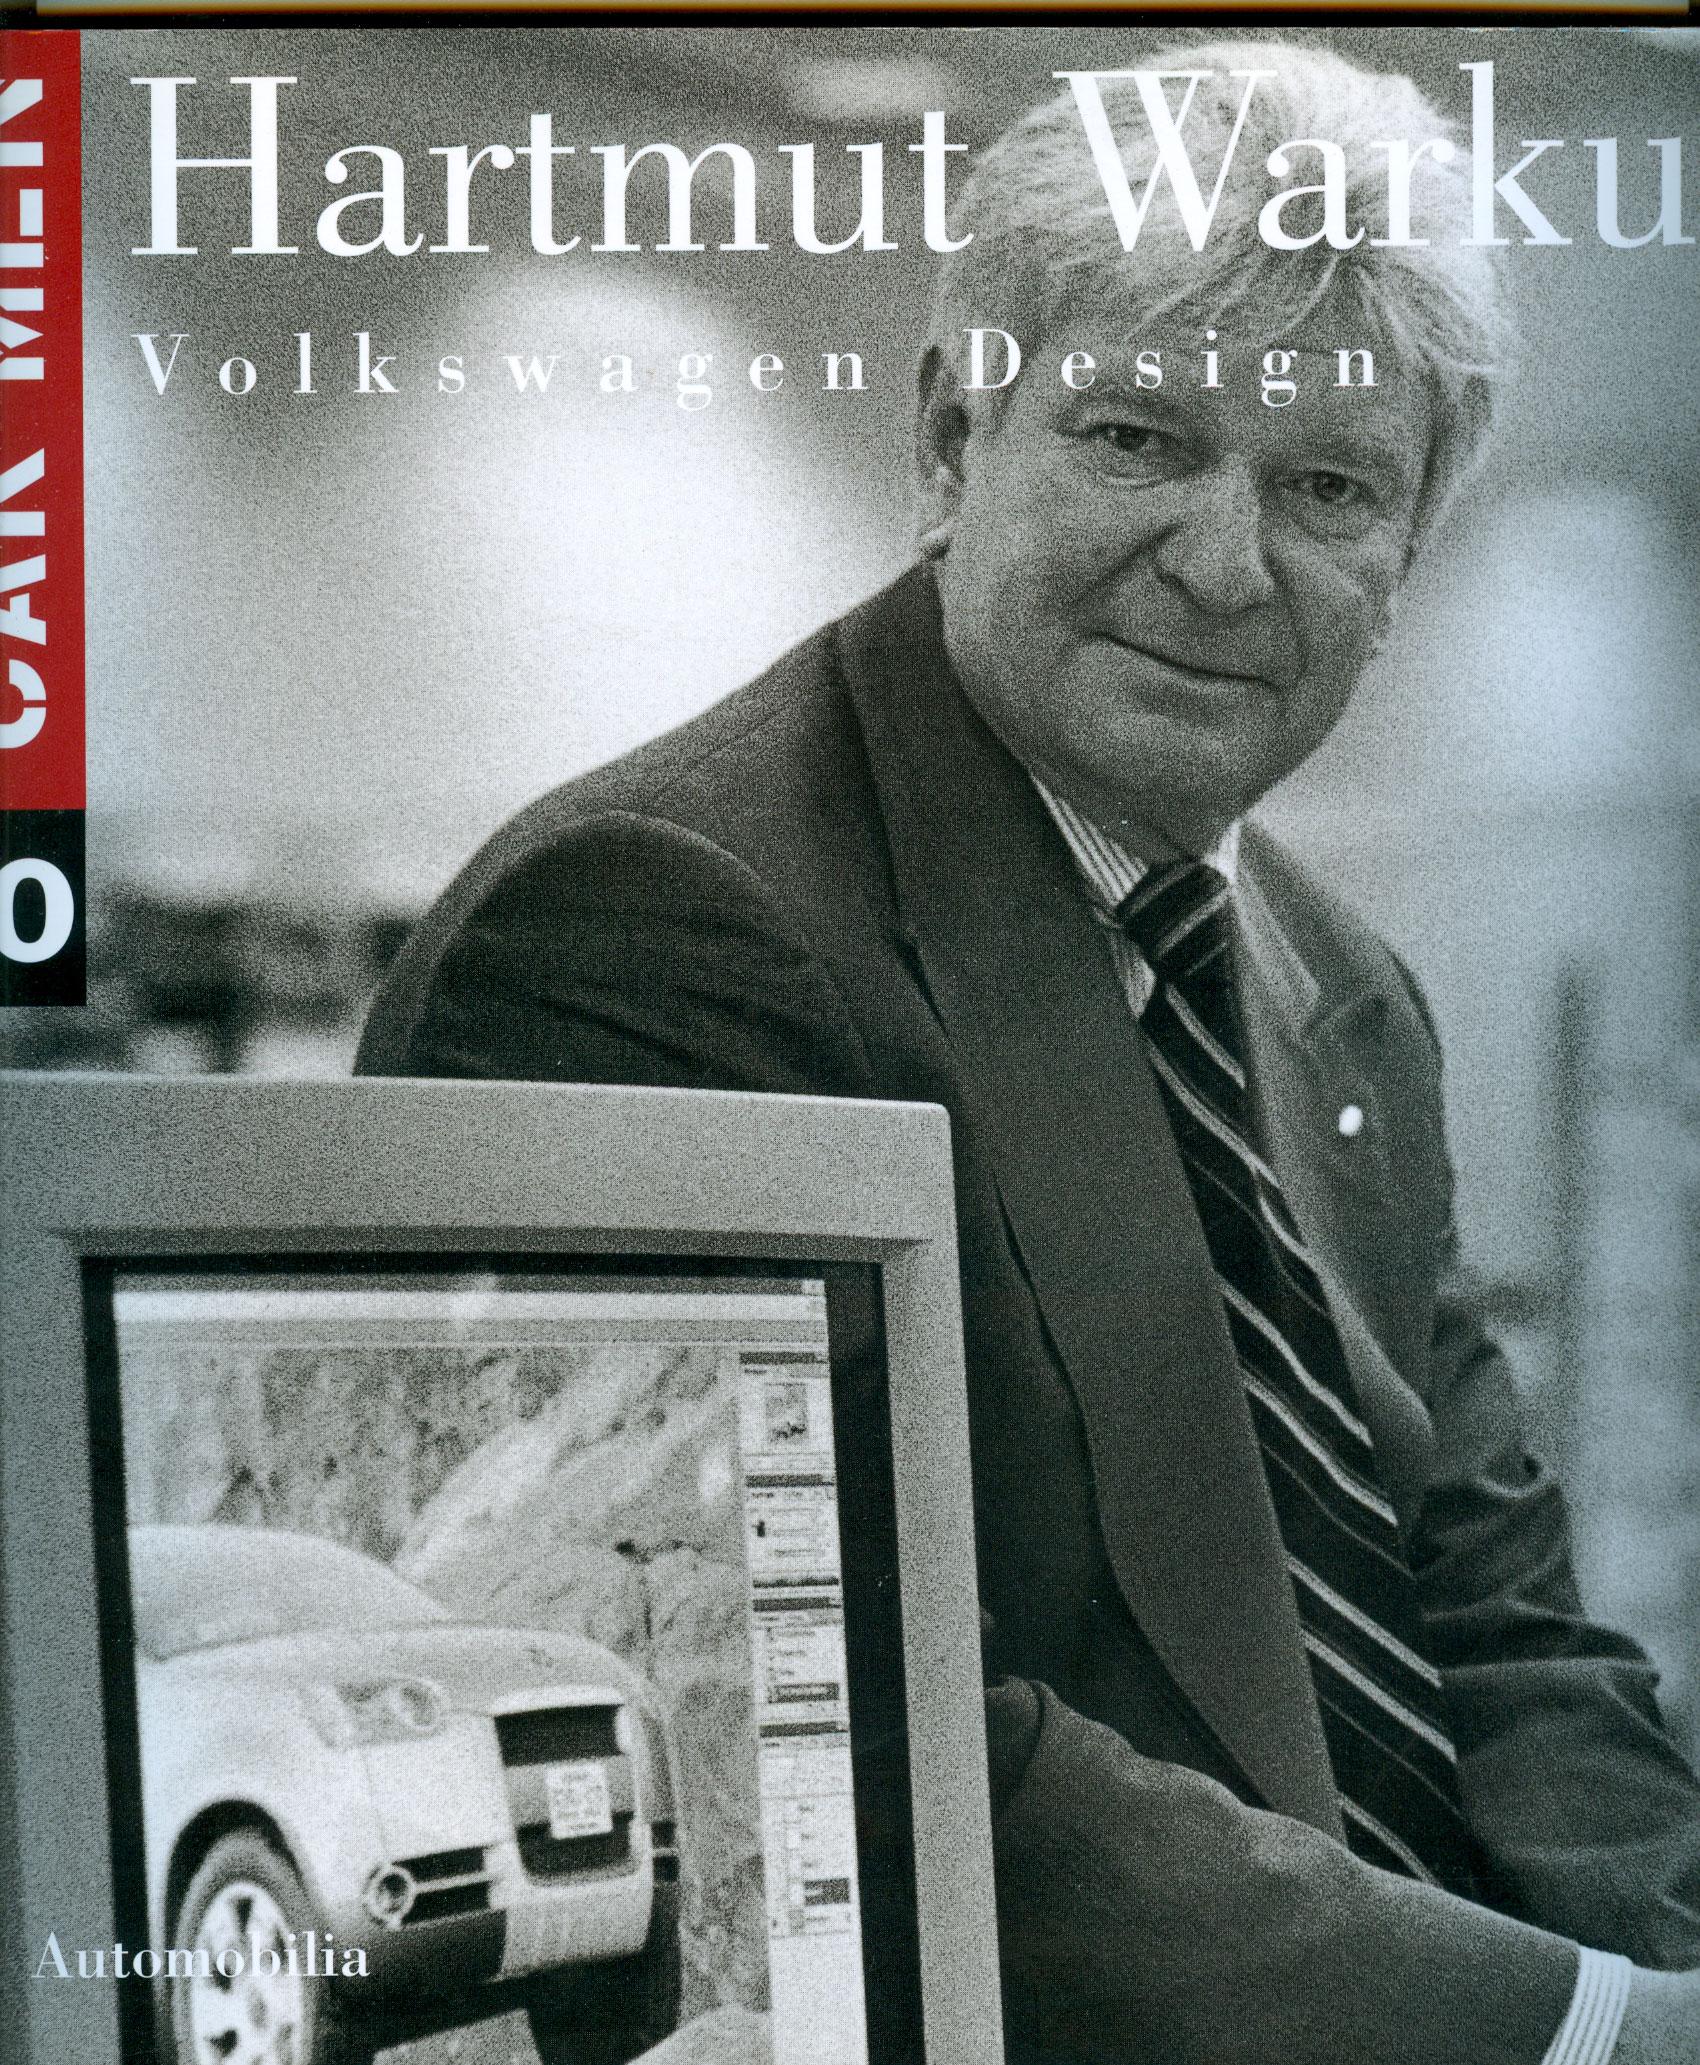 Hartmut Warkus